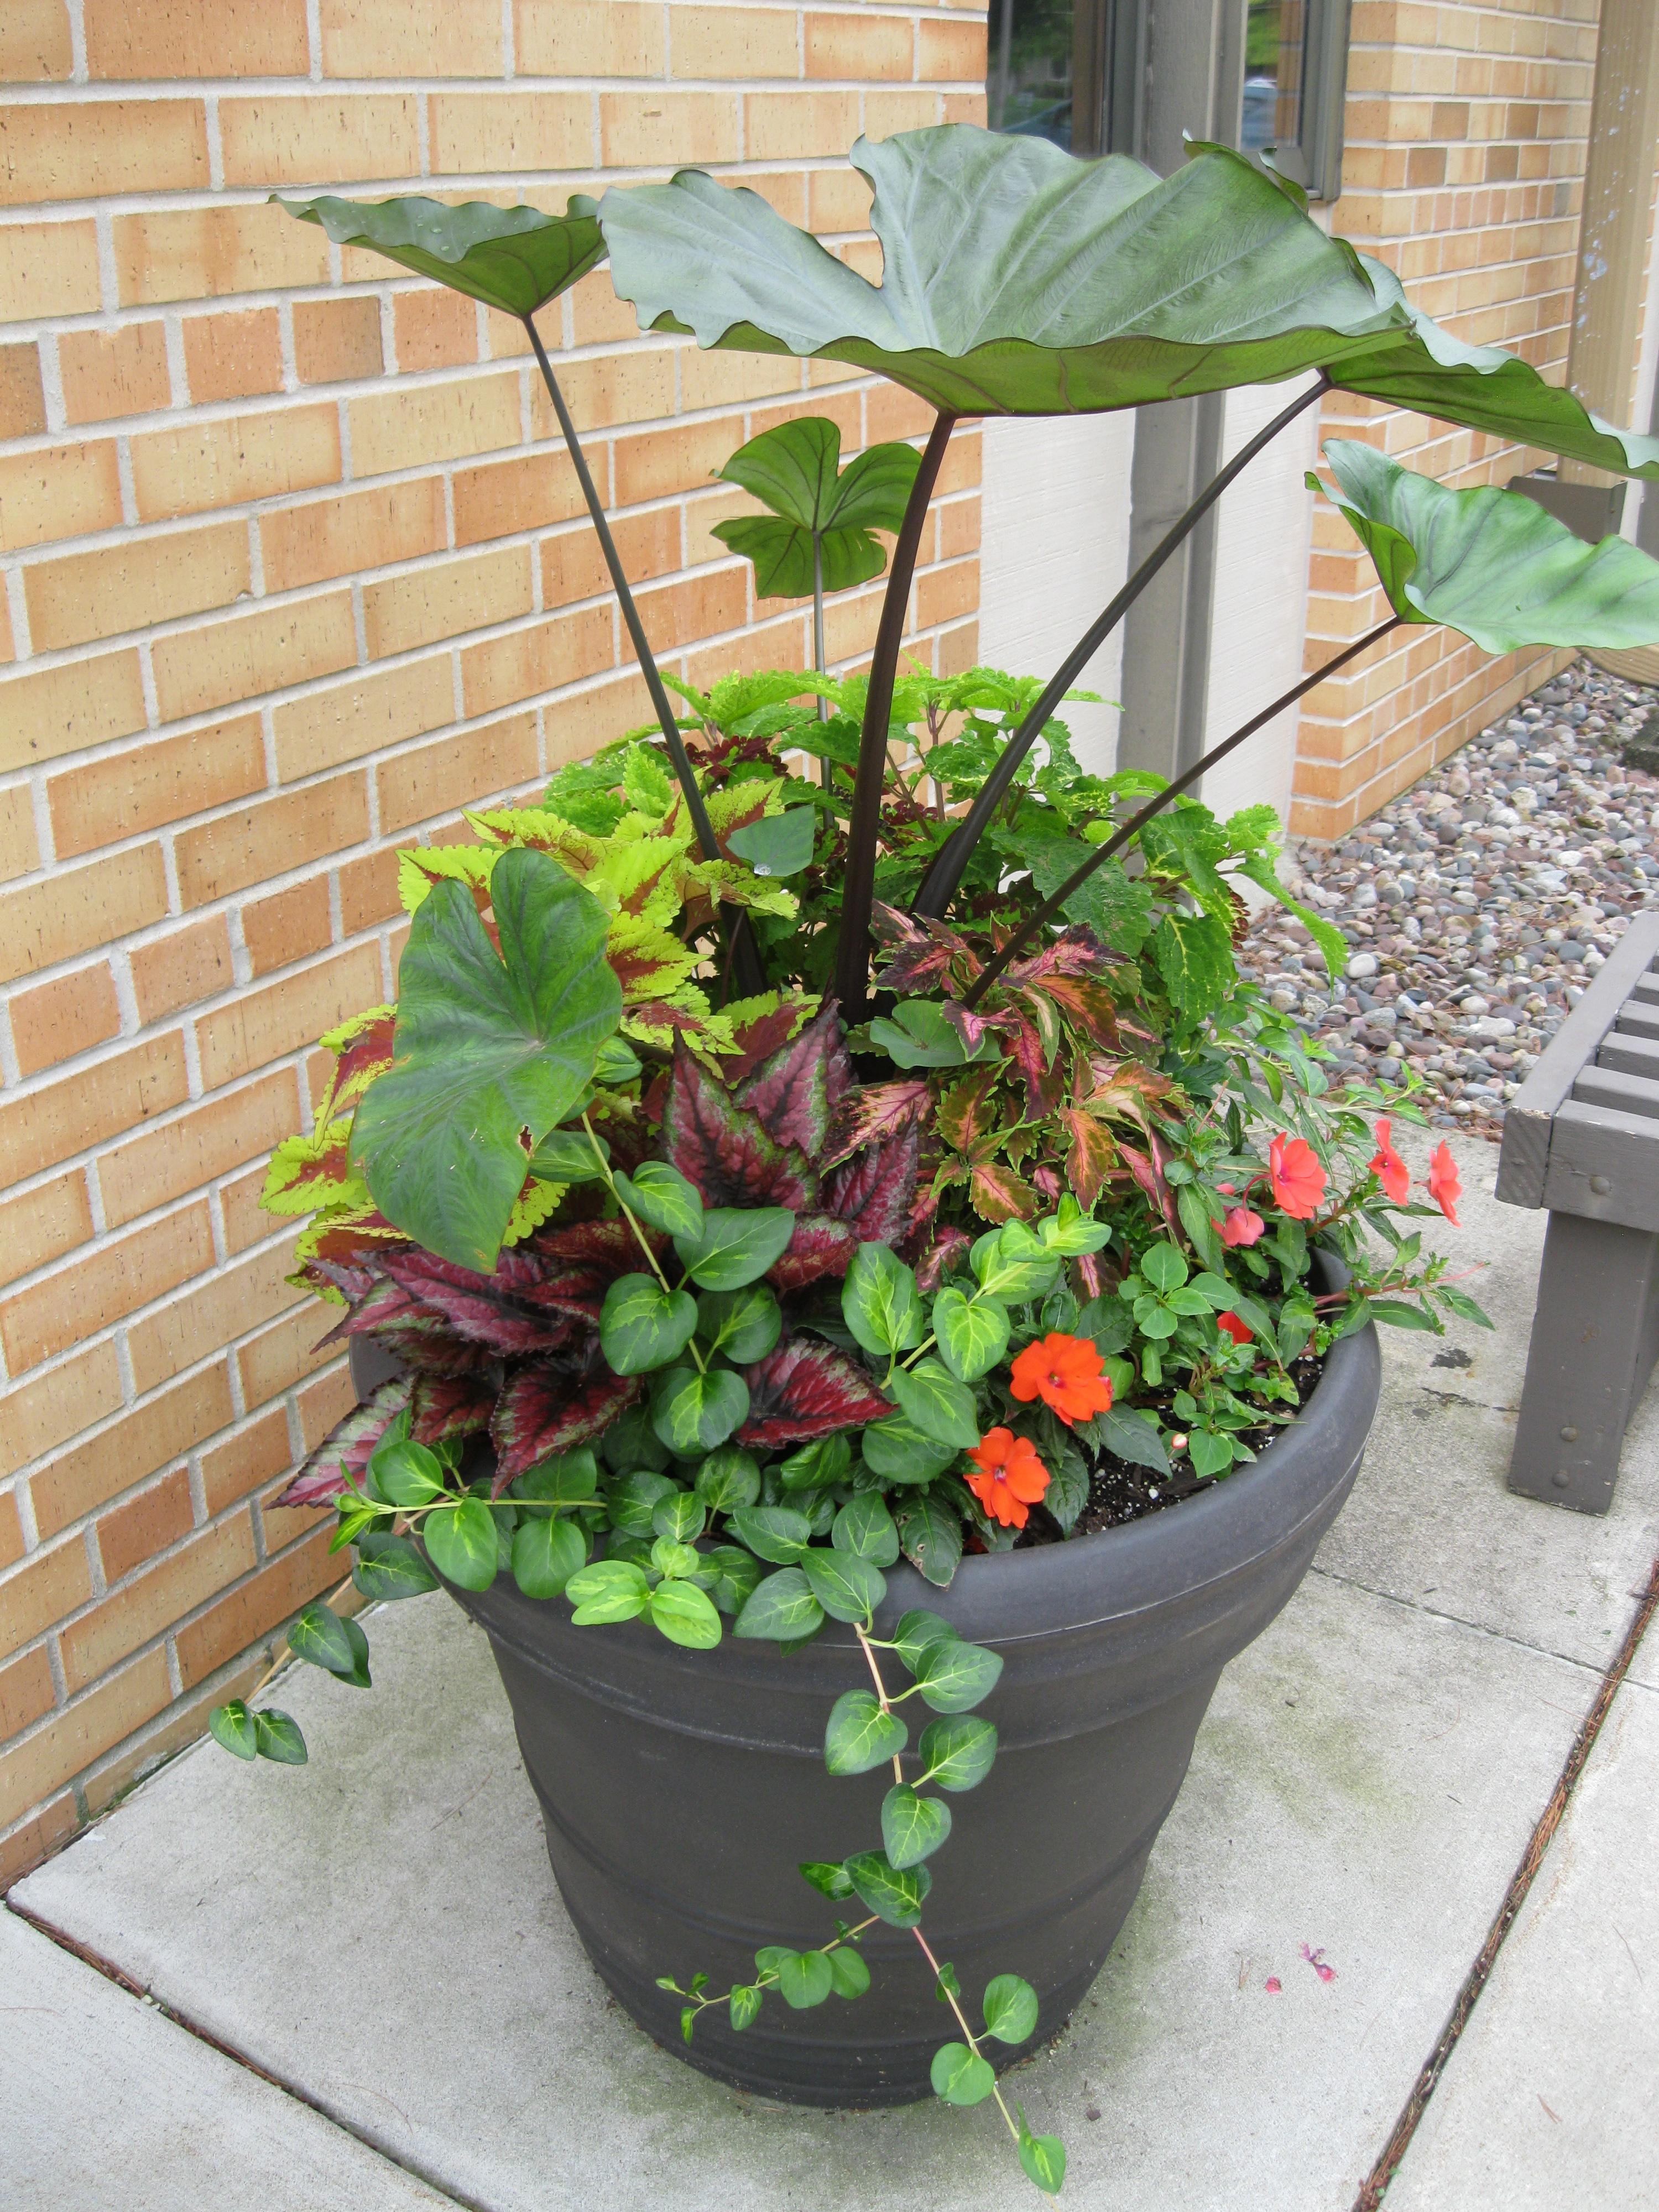 coffee cup  colocasia or elephant ear  plants  u2013 good